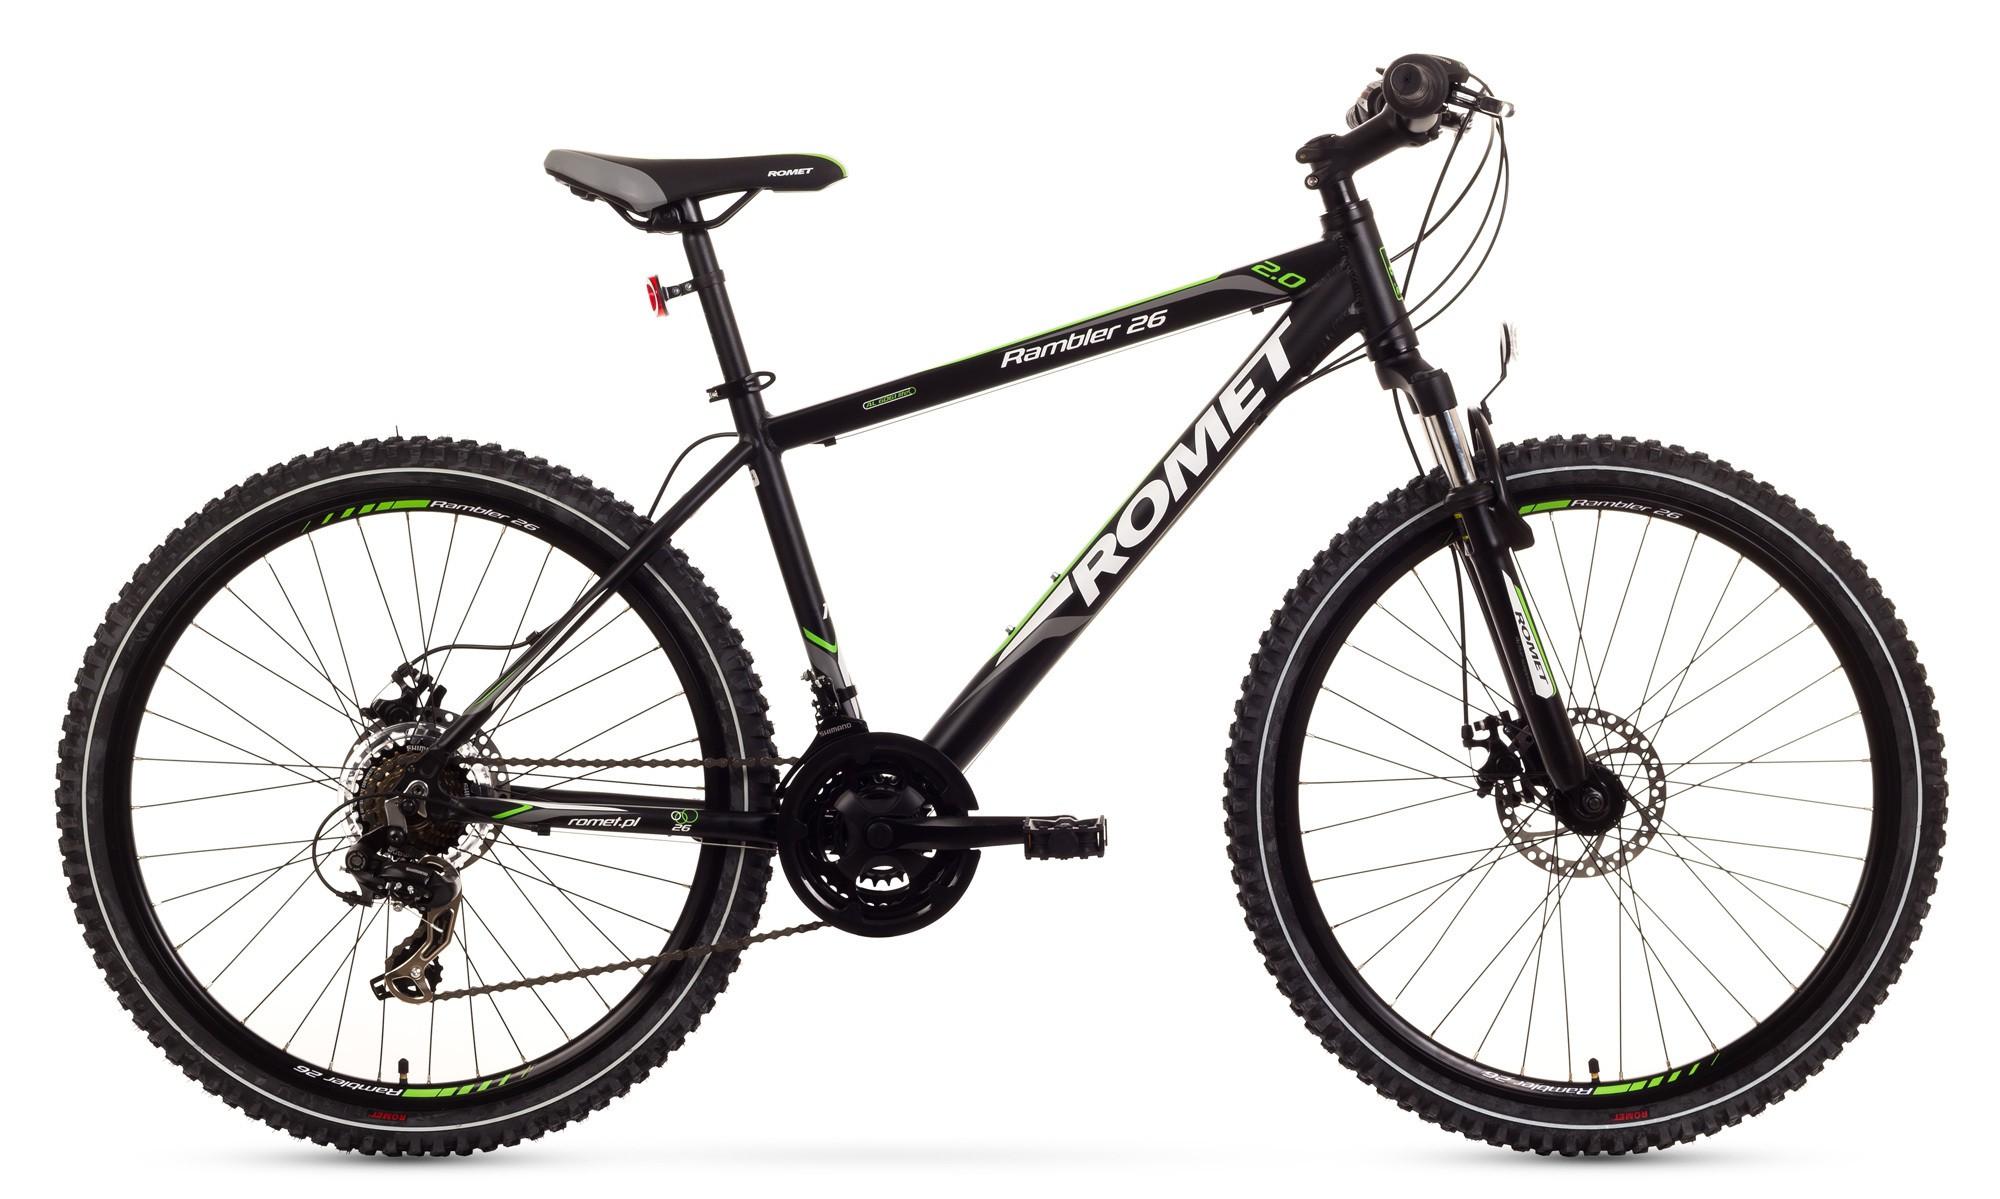 Bicicleta MTB Romet Rambler 26 2.0 - negru-verde